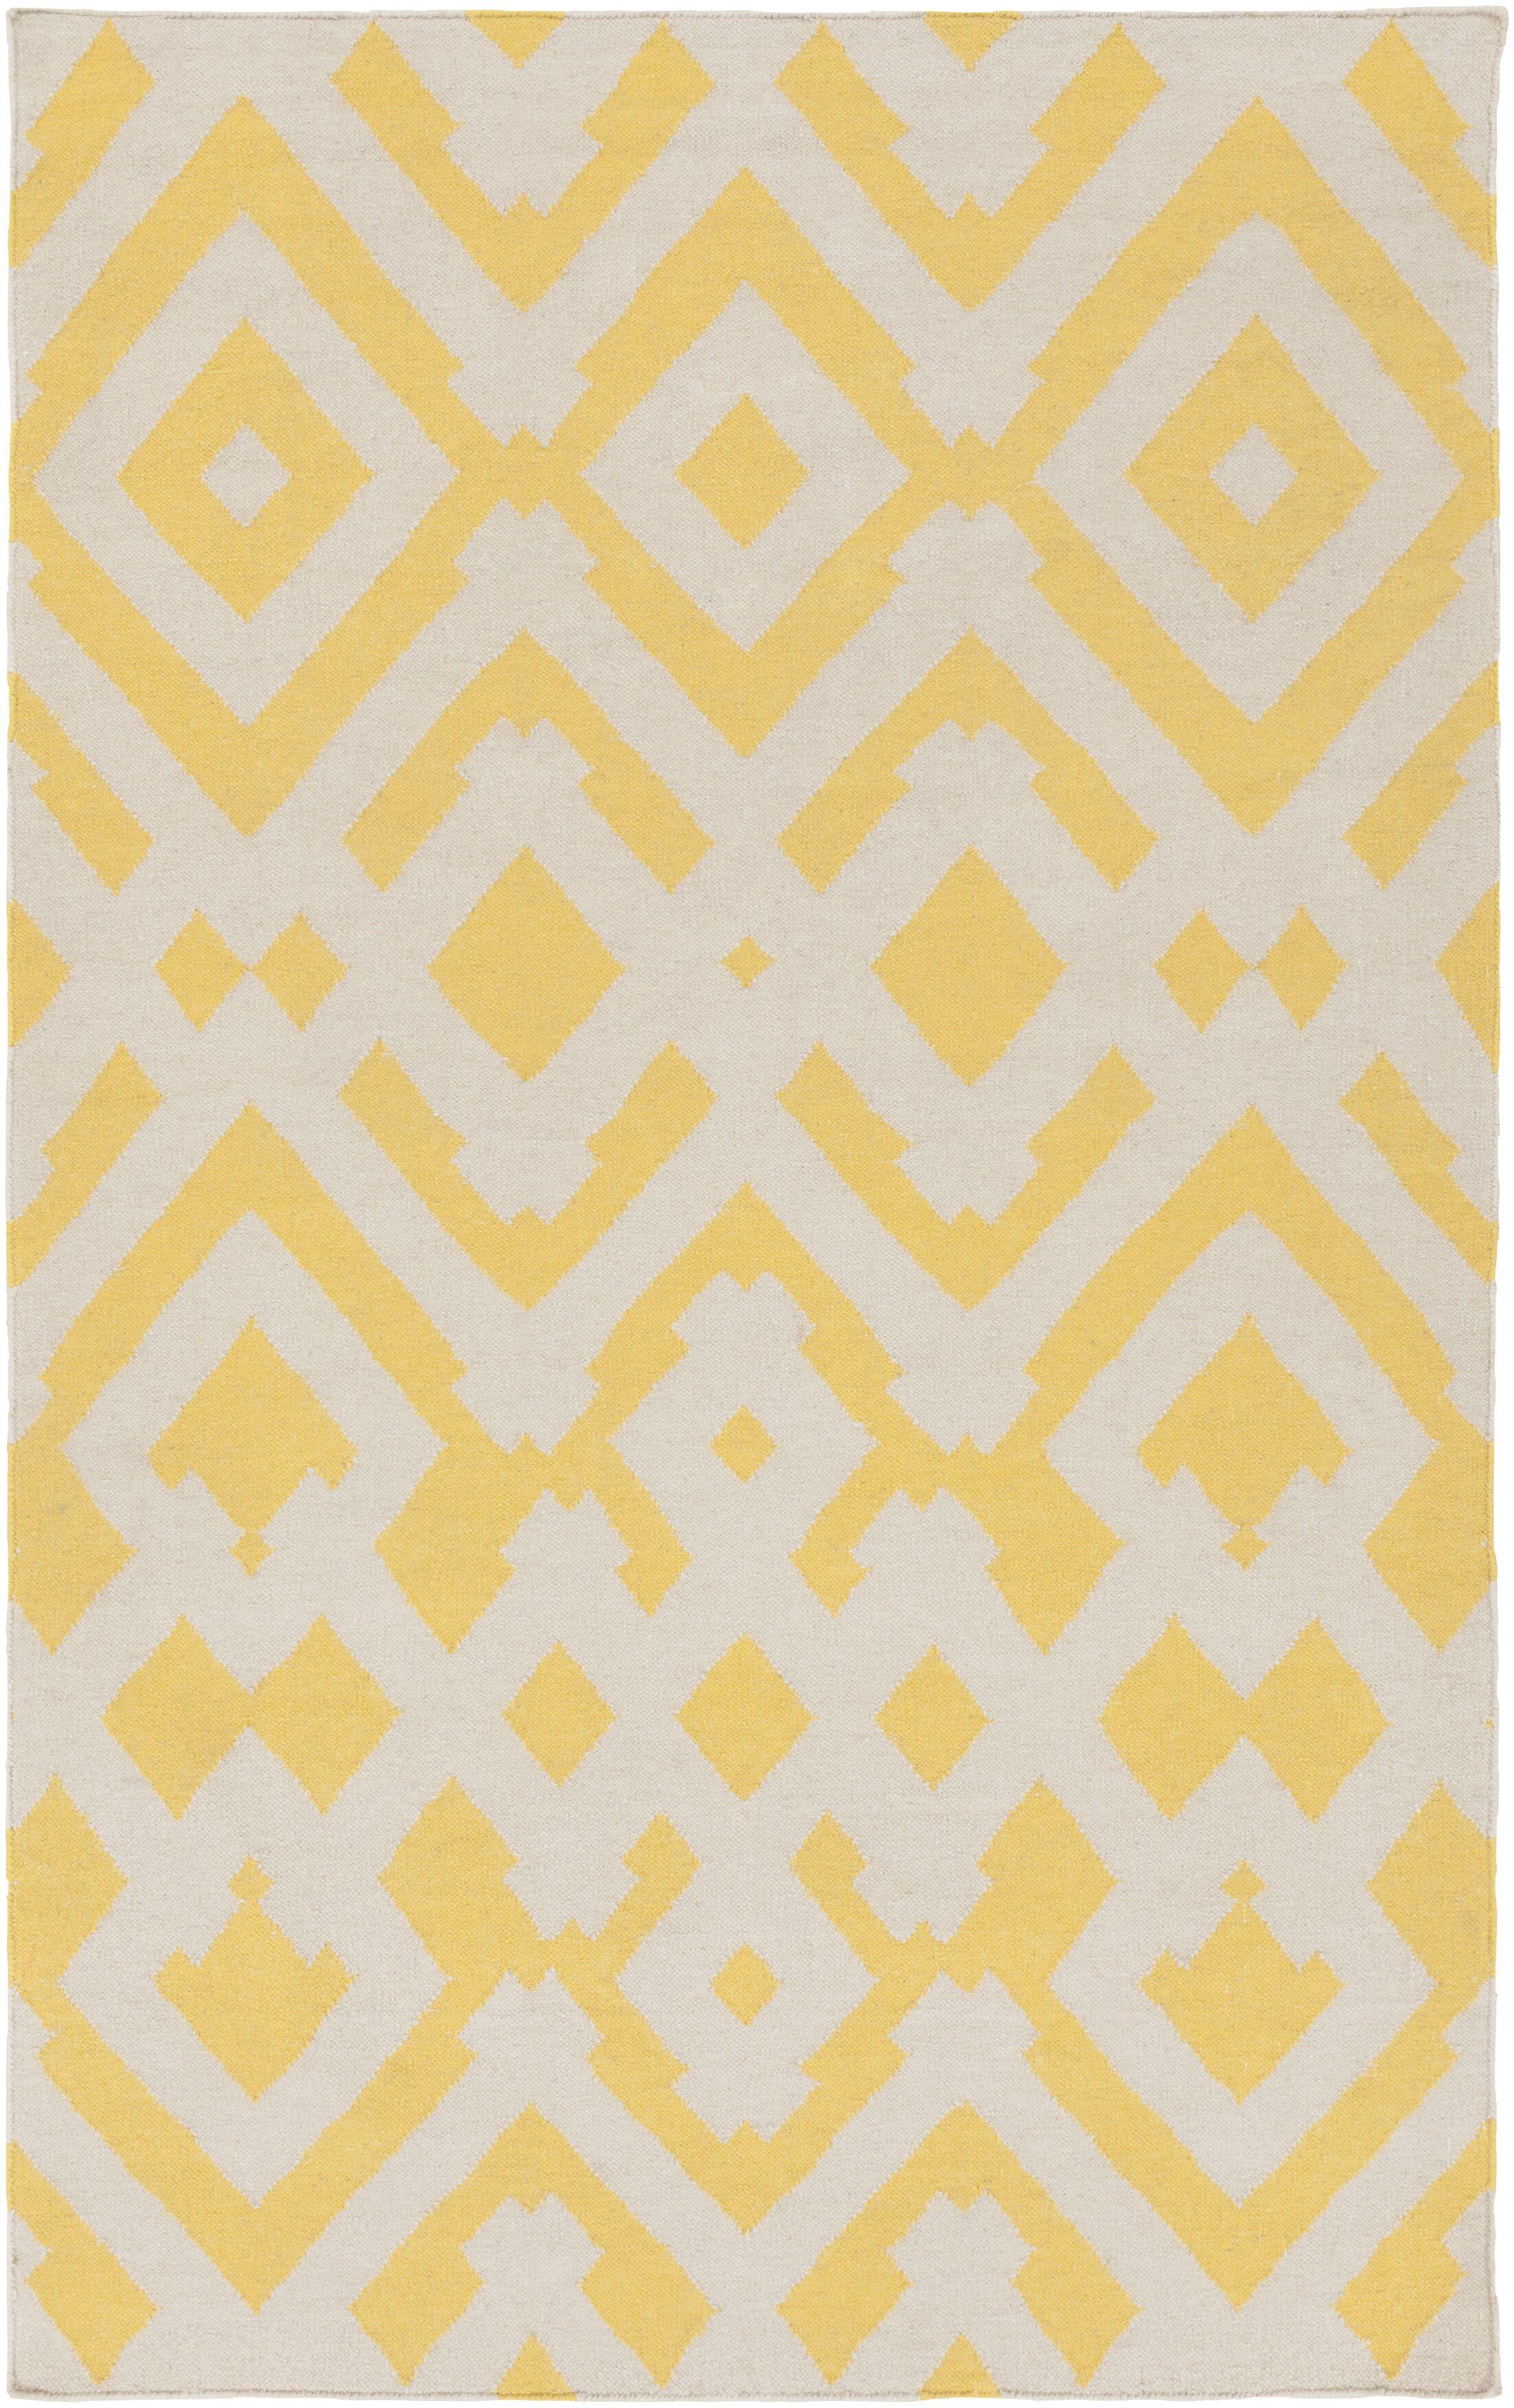 Hemel Beige/Gold Geometric Area Rug Rug Size: Rectangle 5' x 8'